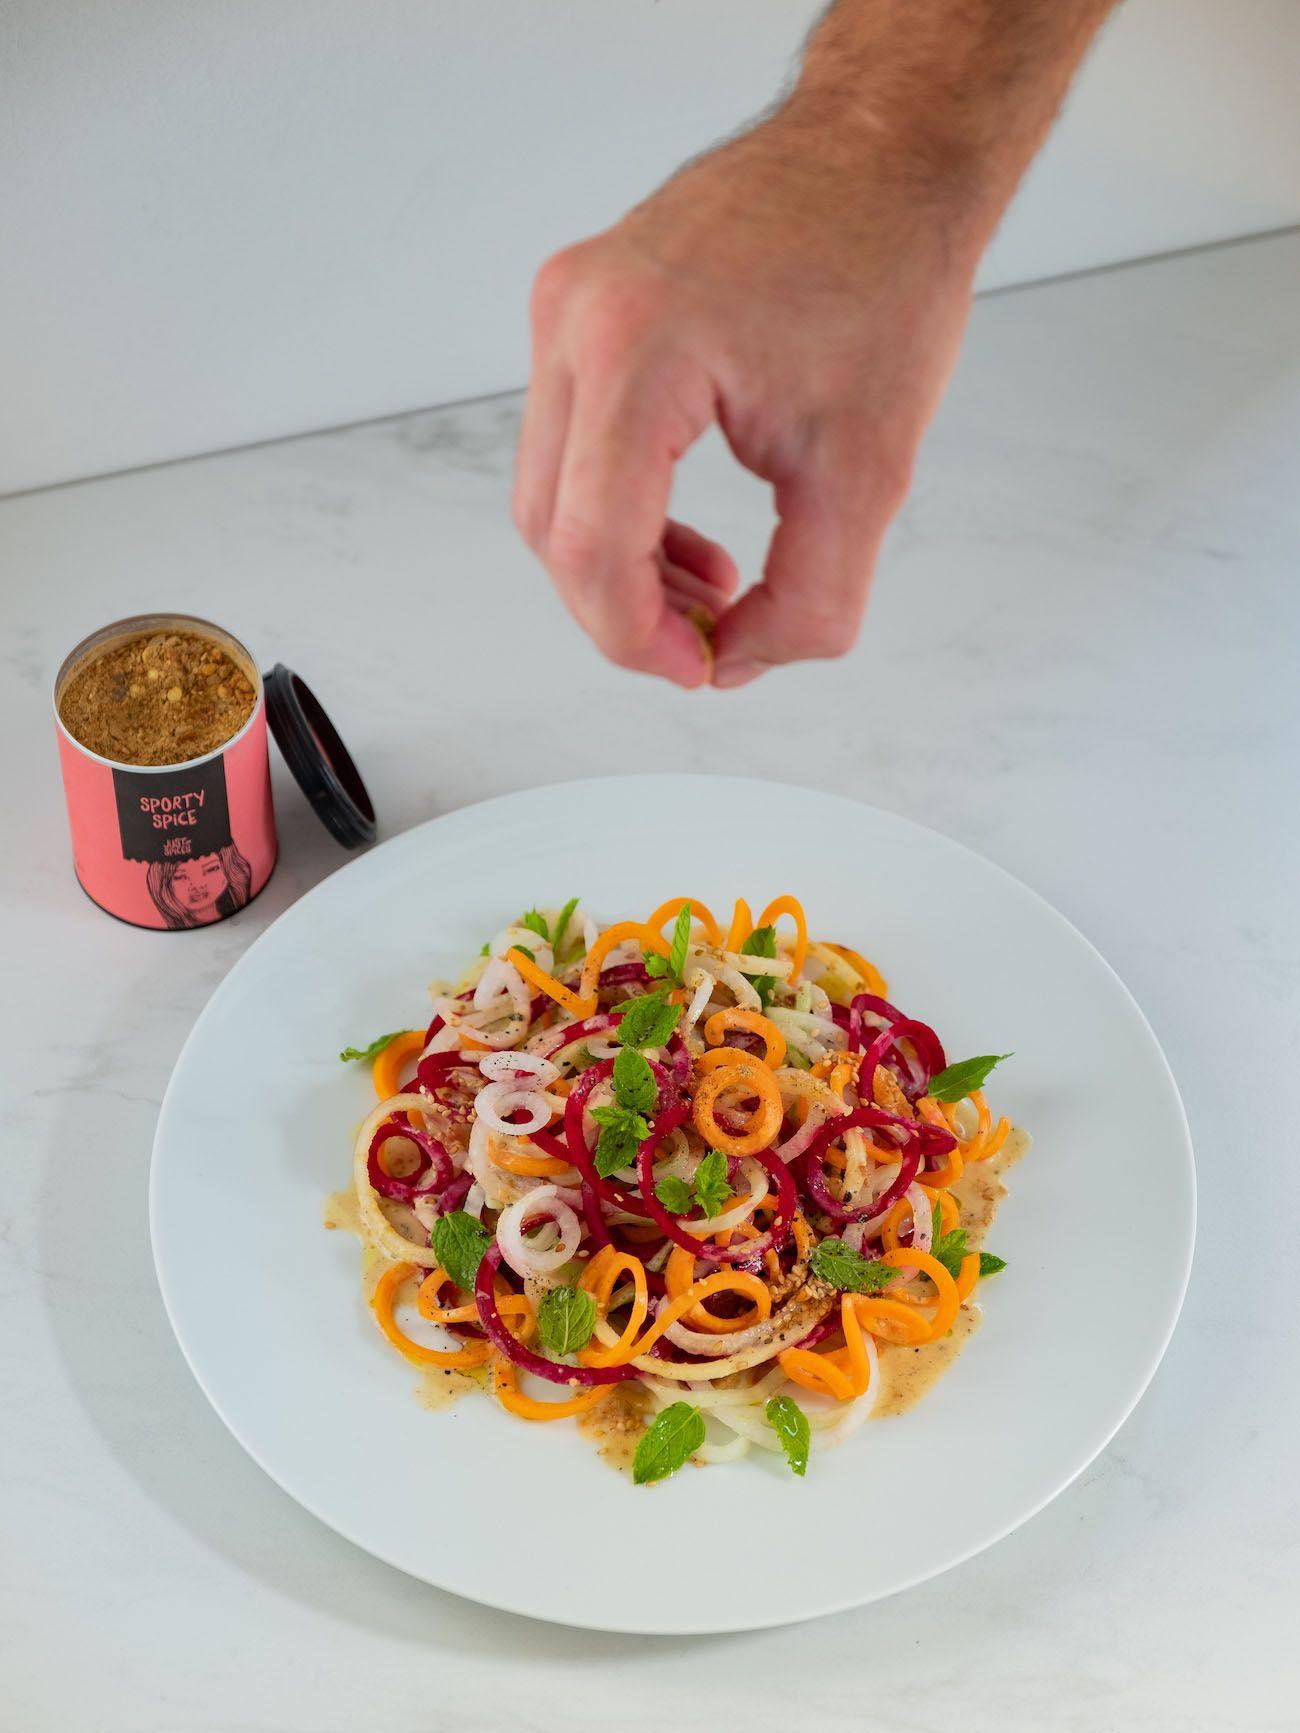 About Fuel, Foodblog, Rezept, Bunter Spiralensalat mit Tahini-Dressing, Just Spices, Karotte, Rettich, Gurke